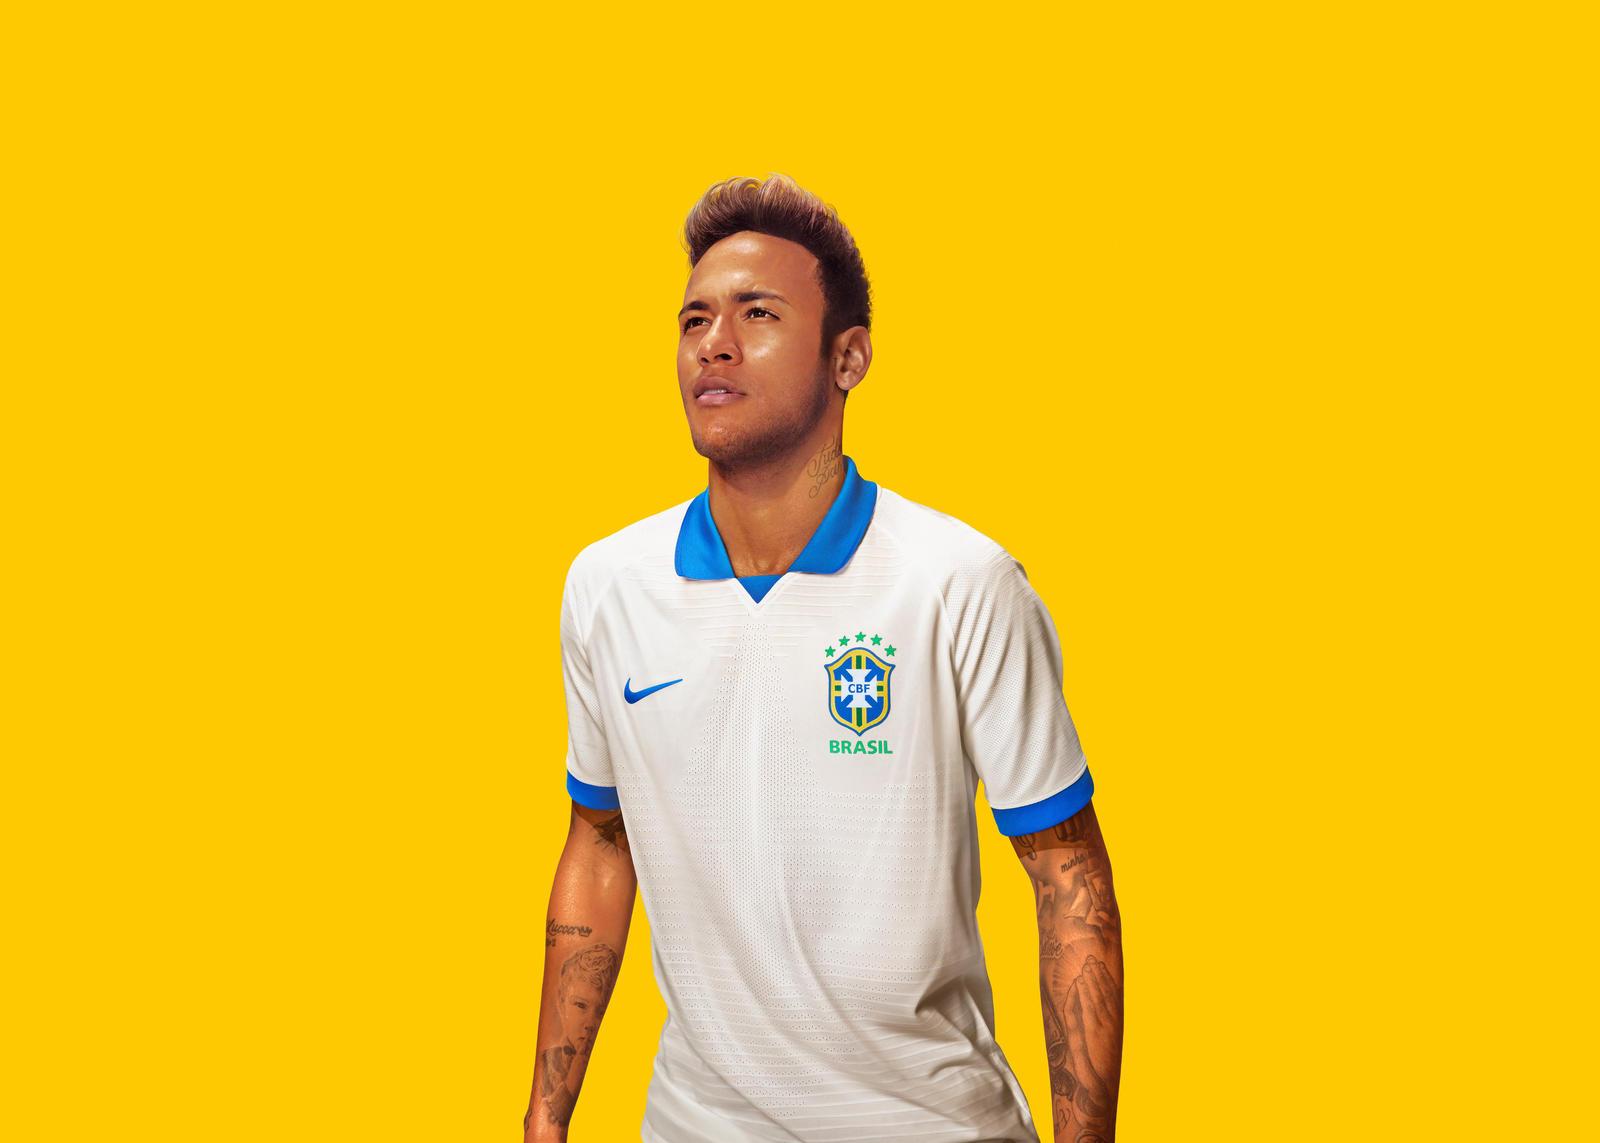 nike-brasil-copa-america-100th-anniversary-jersey-4_rectangle_1600